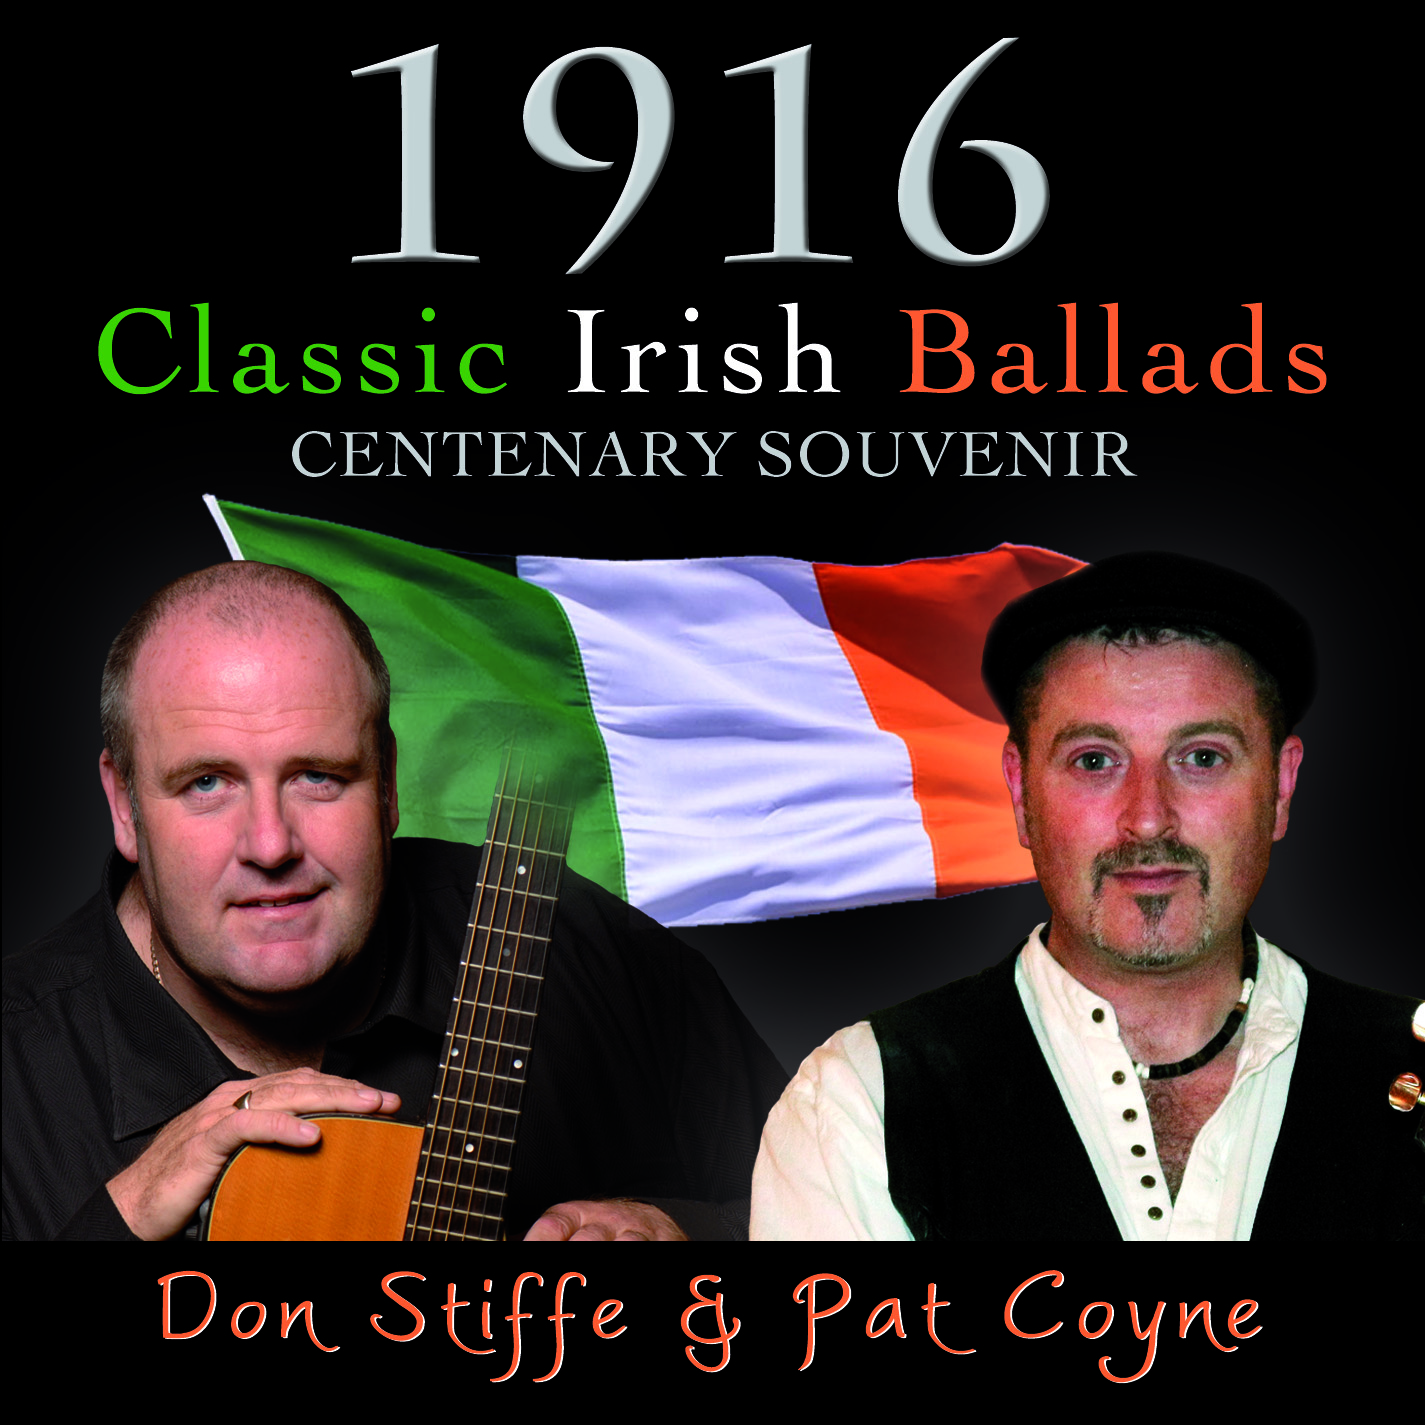 Classic Irish Ballads 1916 - Don Stiffe